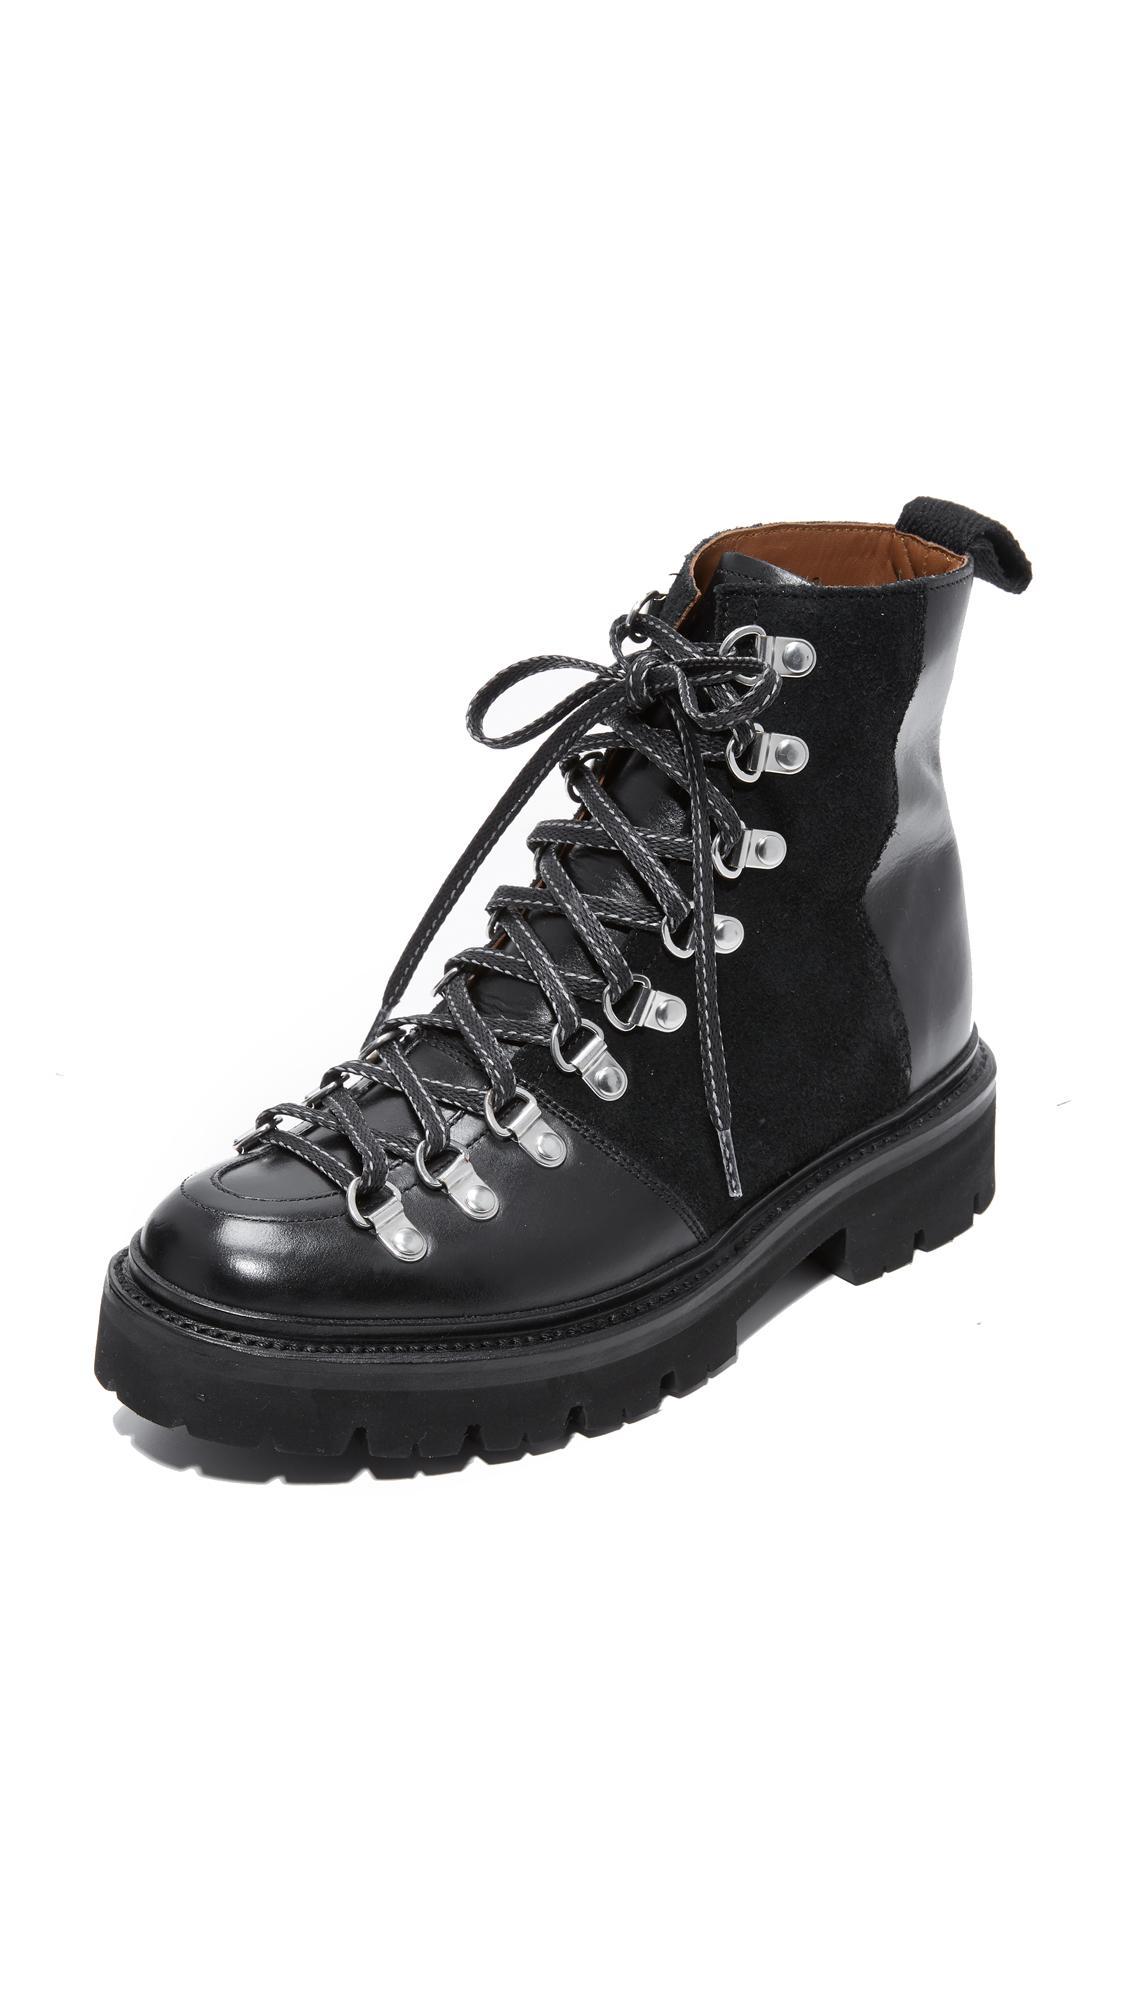 Grenson Shoes New York